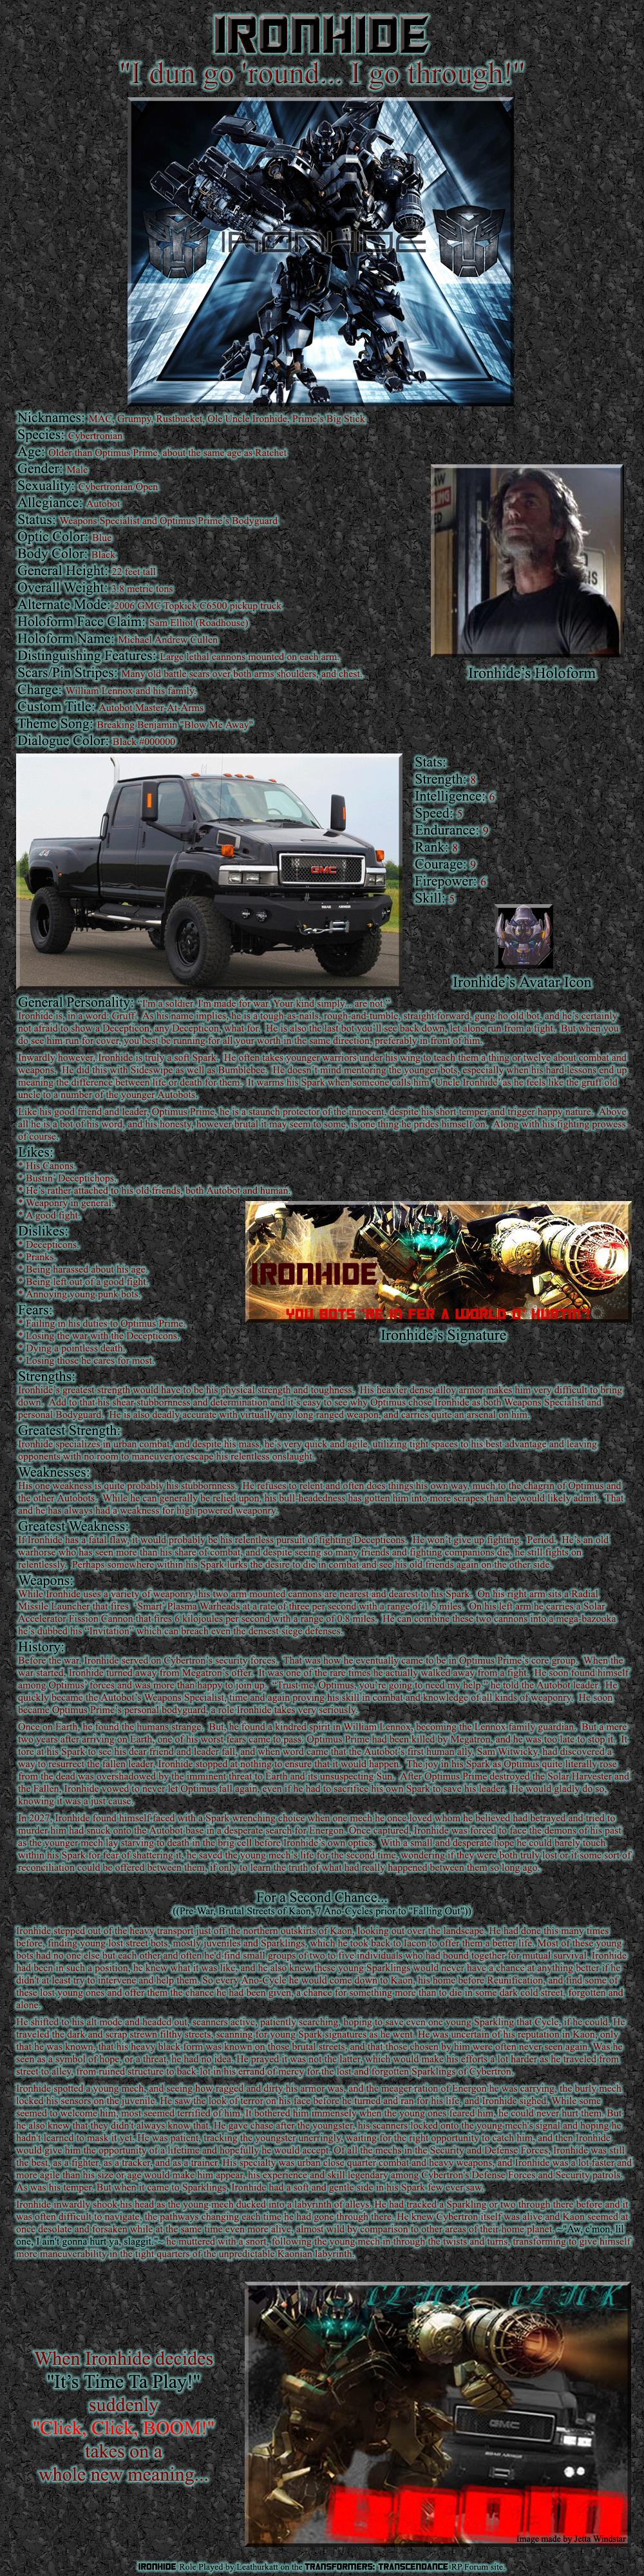 Ironhide RP Bio by Leathurkatt-TFTiggy